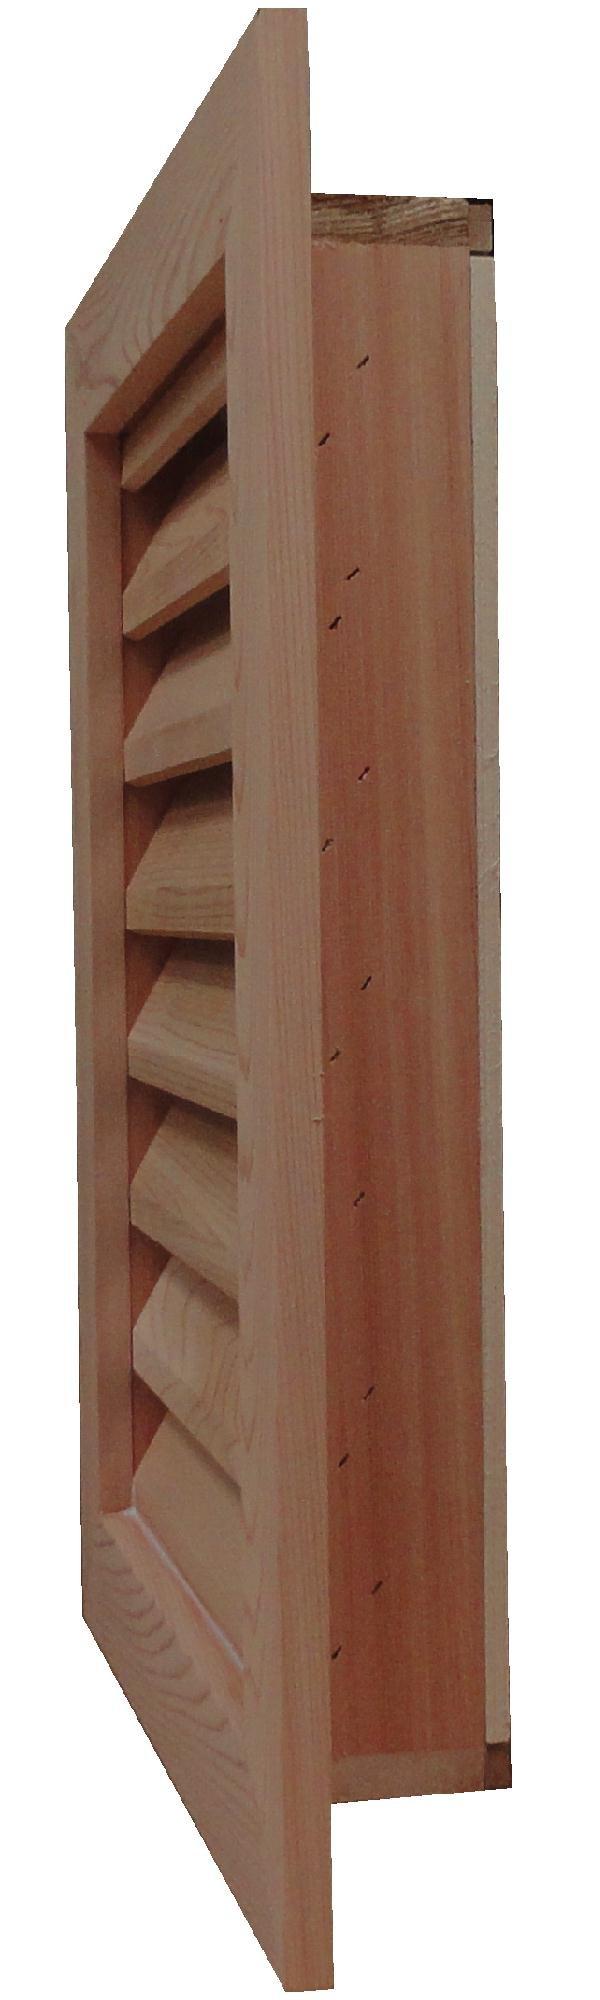 GC1236 Cedar Wood Gable Vent ~ Louver box 11.5 x 35.5 ~ Overall 15.5'' x 39.5'' ~ Kimball Designs Sanded Smooth Functional Ventilation